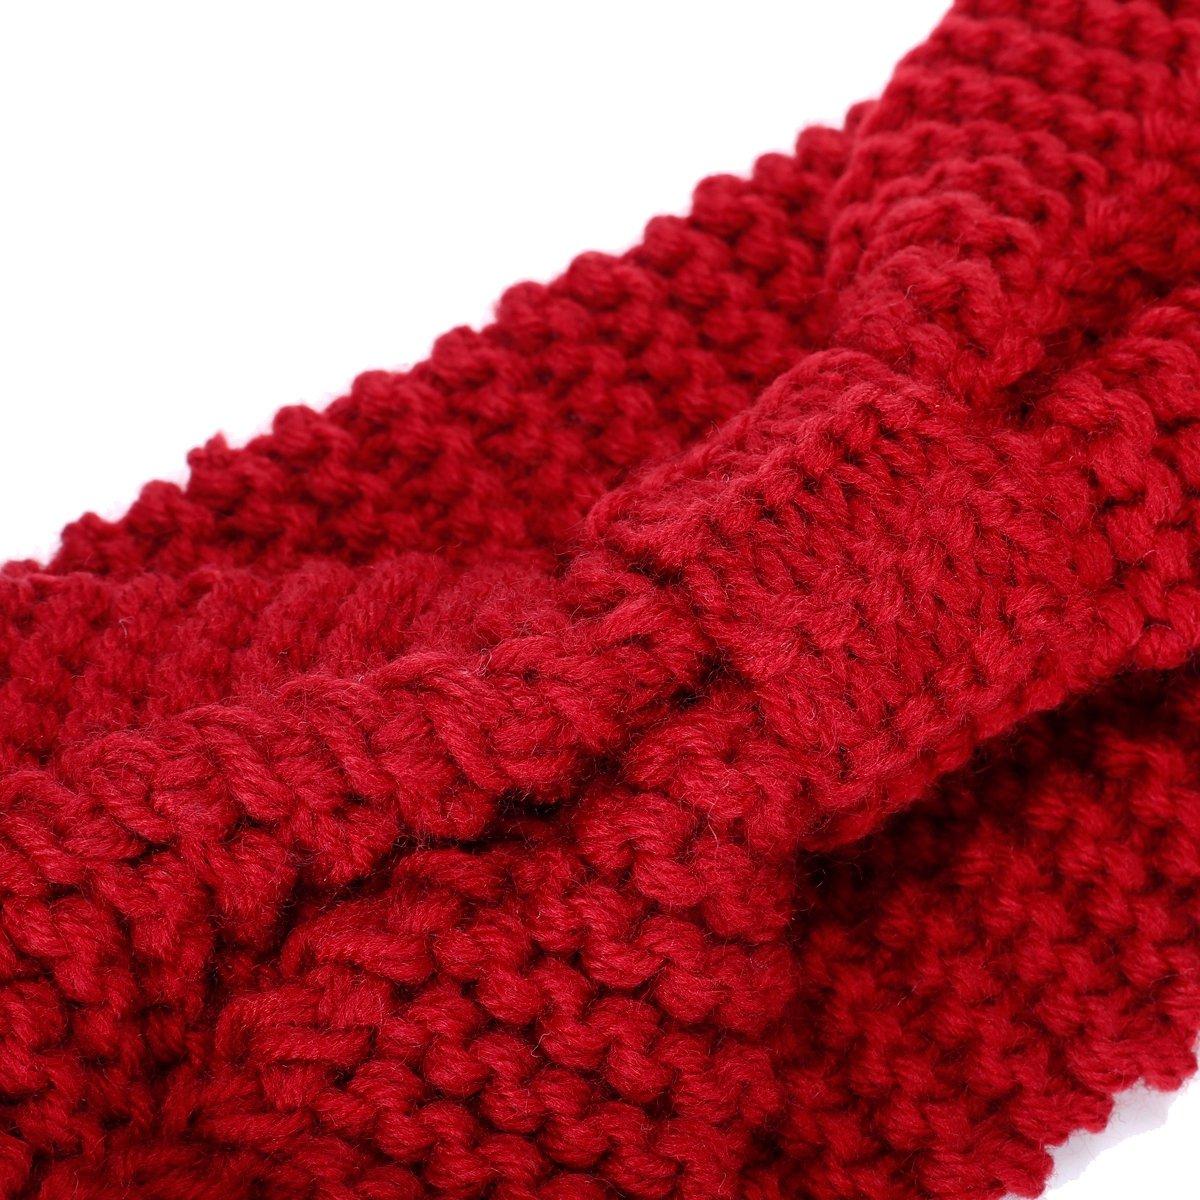 ieasysexy Women's Knitted Turban Bow Headband Ear Warmer Head Wrap